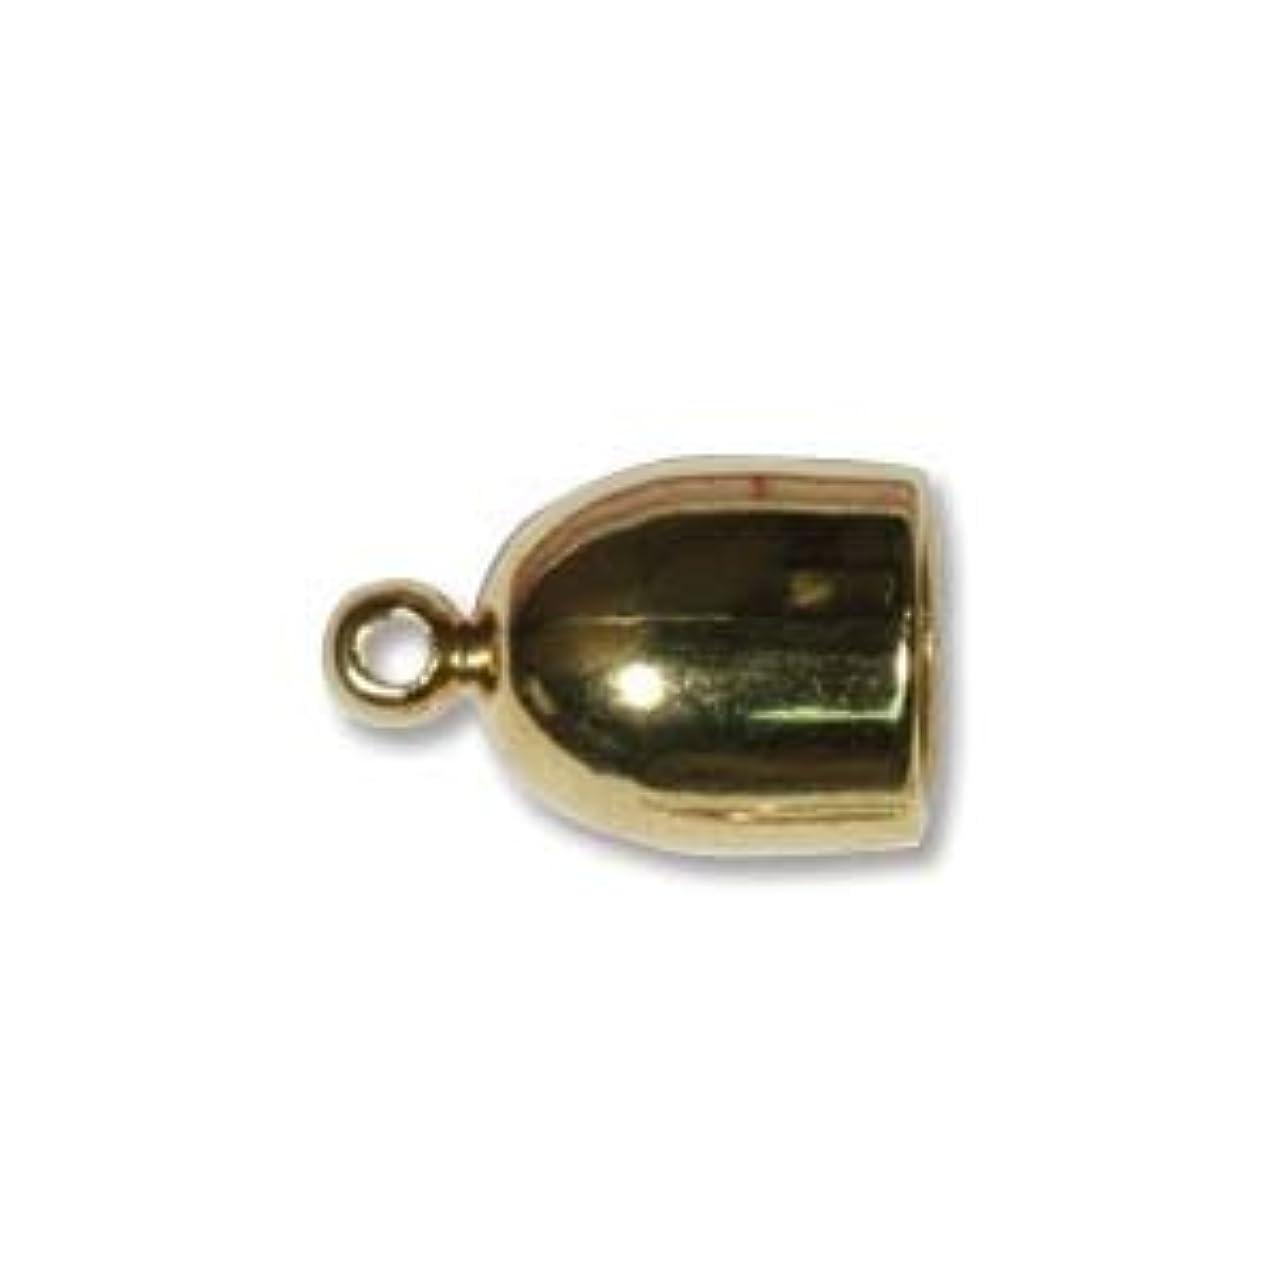 Gold Plate Bullet End Cap 6mm (6)